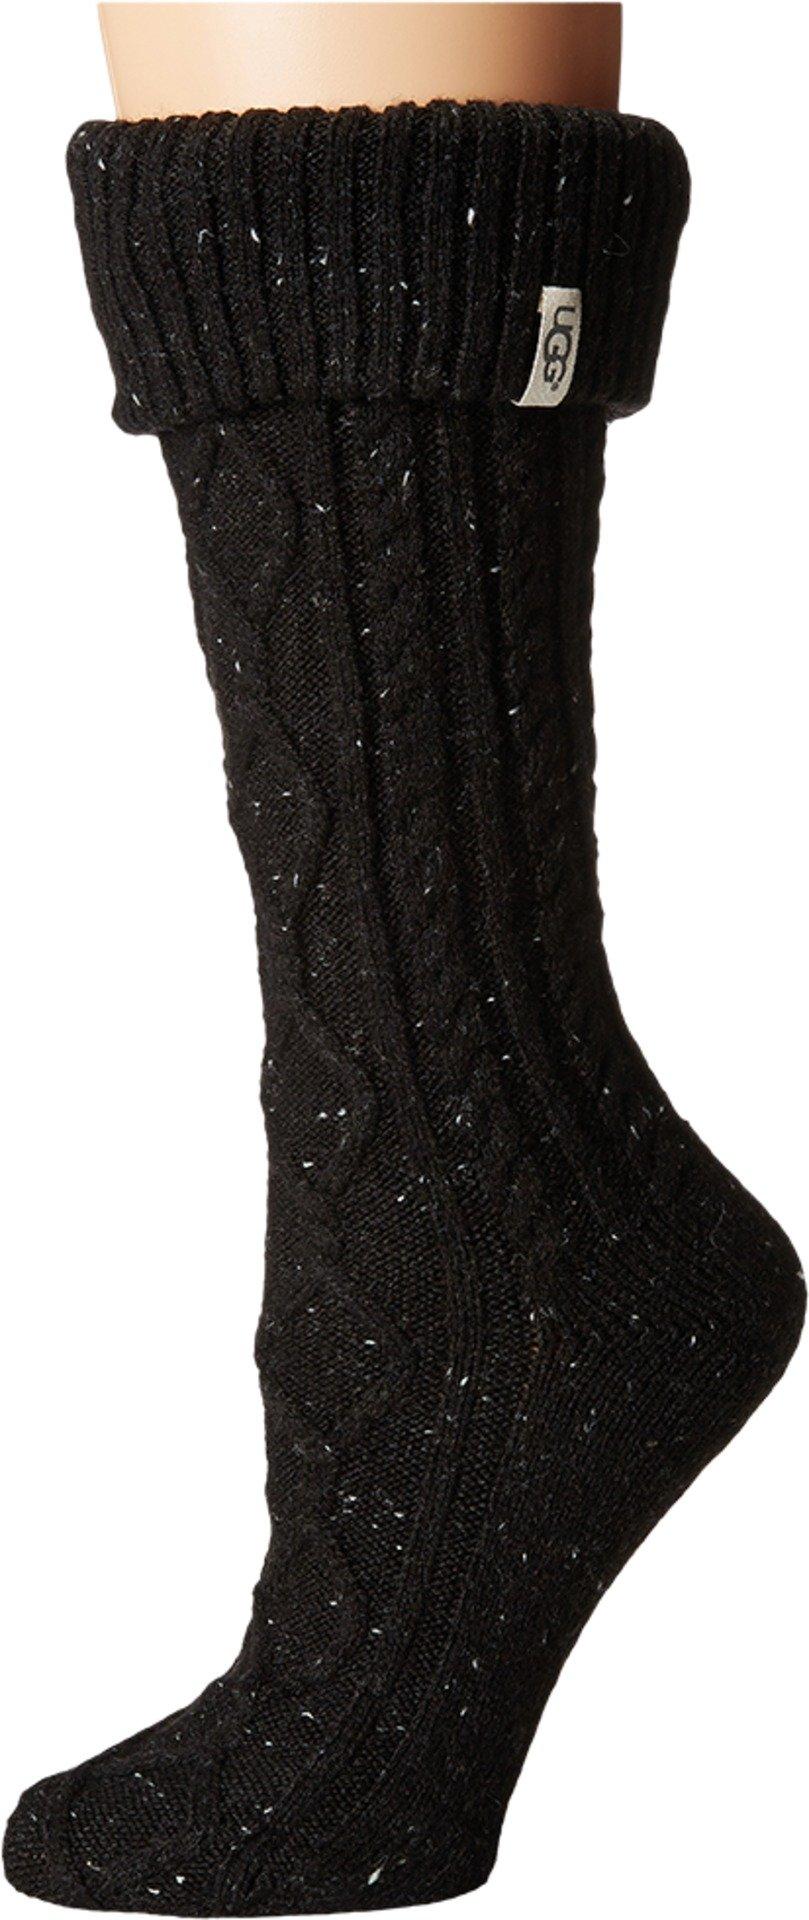 UGG B2 Women's Shaye Tall Rainboot Sock, Black, O/S